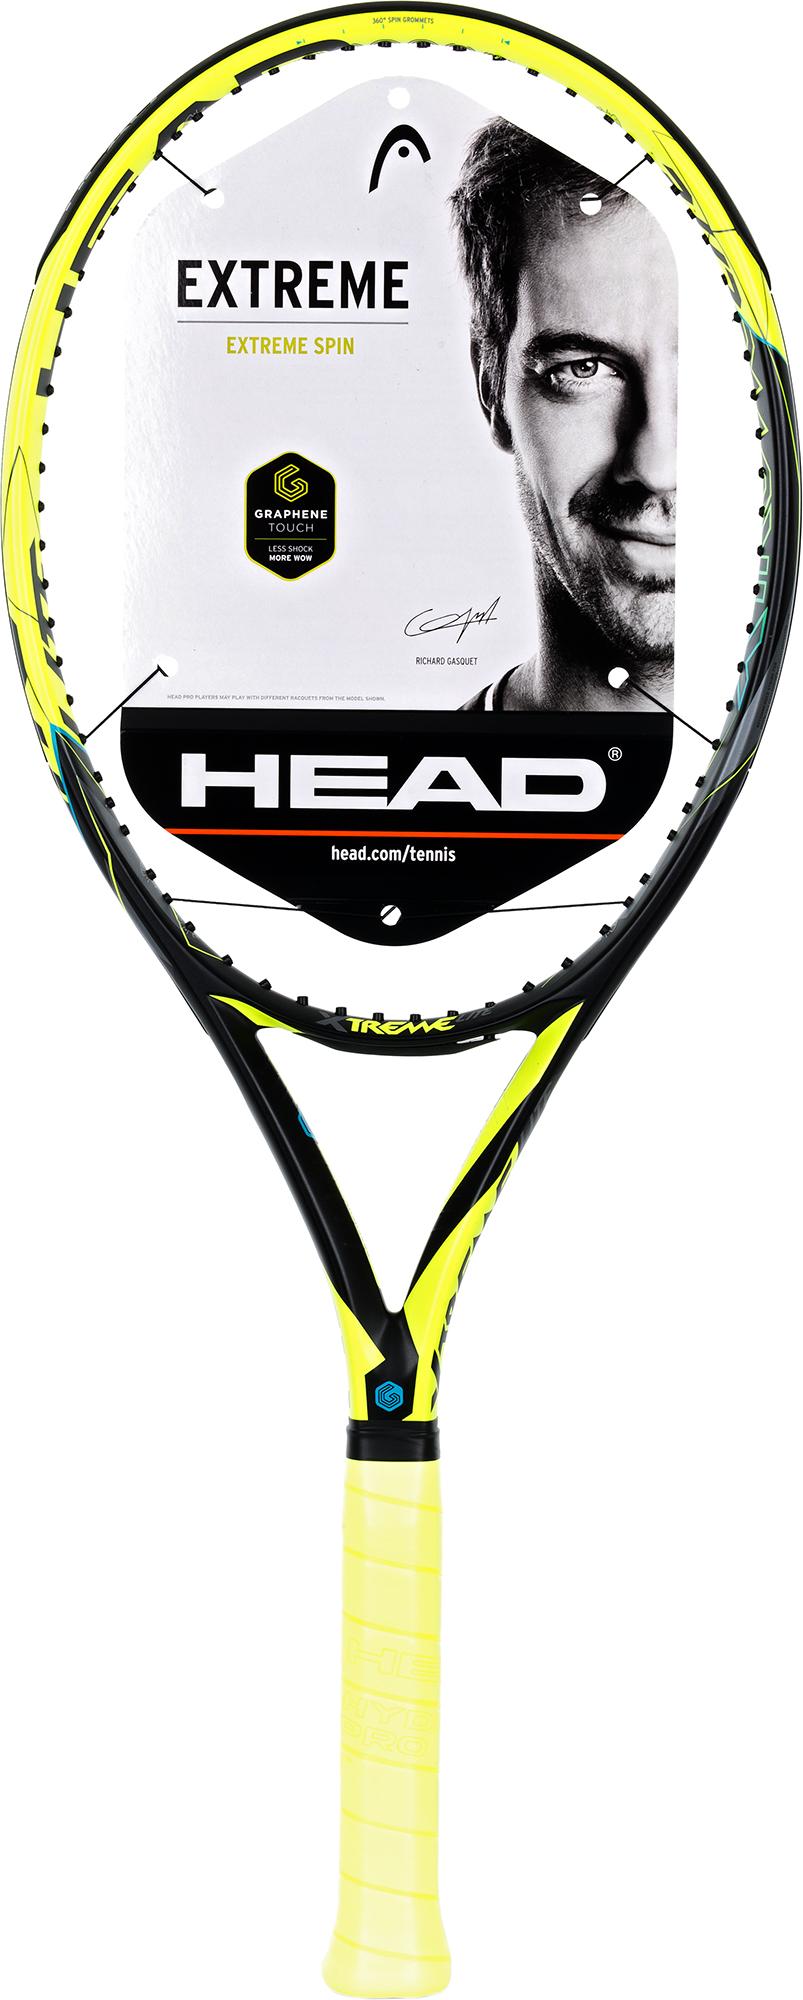 Head Ракетка для большого тенниса Head Graphene Touch Extreme Lite, размер 3 head ракетка для большого тенниса детская head novak 23 размер без размера